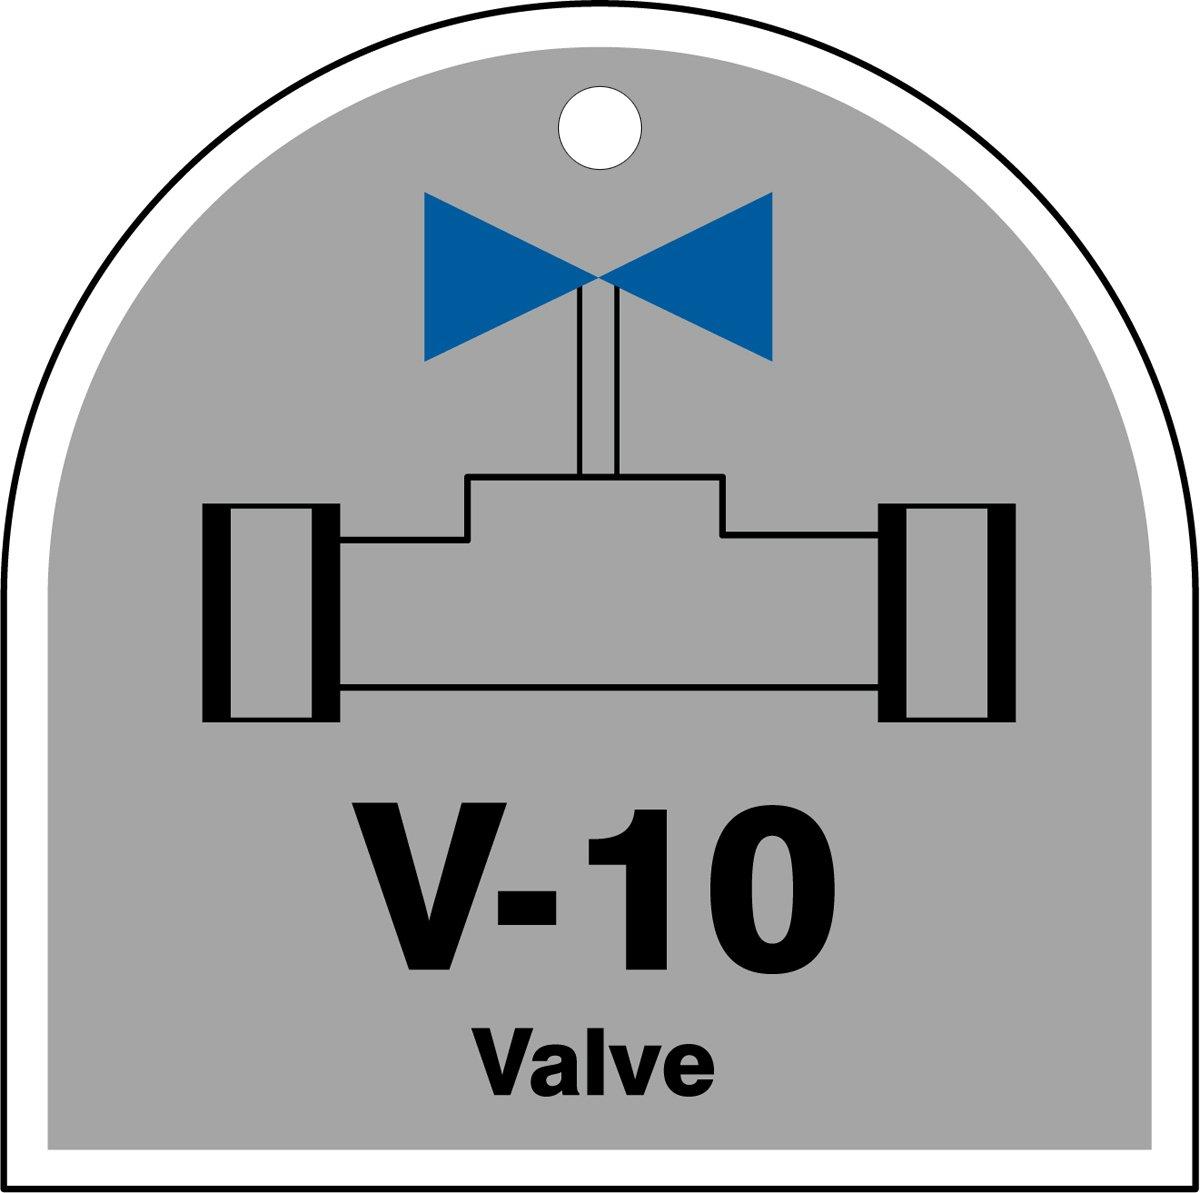 Accuform TDJ210VPE PlasticV-10 Valve Energy Source Shape ID Tag Black//Blue//White on Gray 2-1//2 W x 2-1//2 L 2-1//2 W x 2-1//2 L